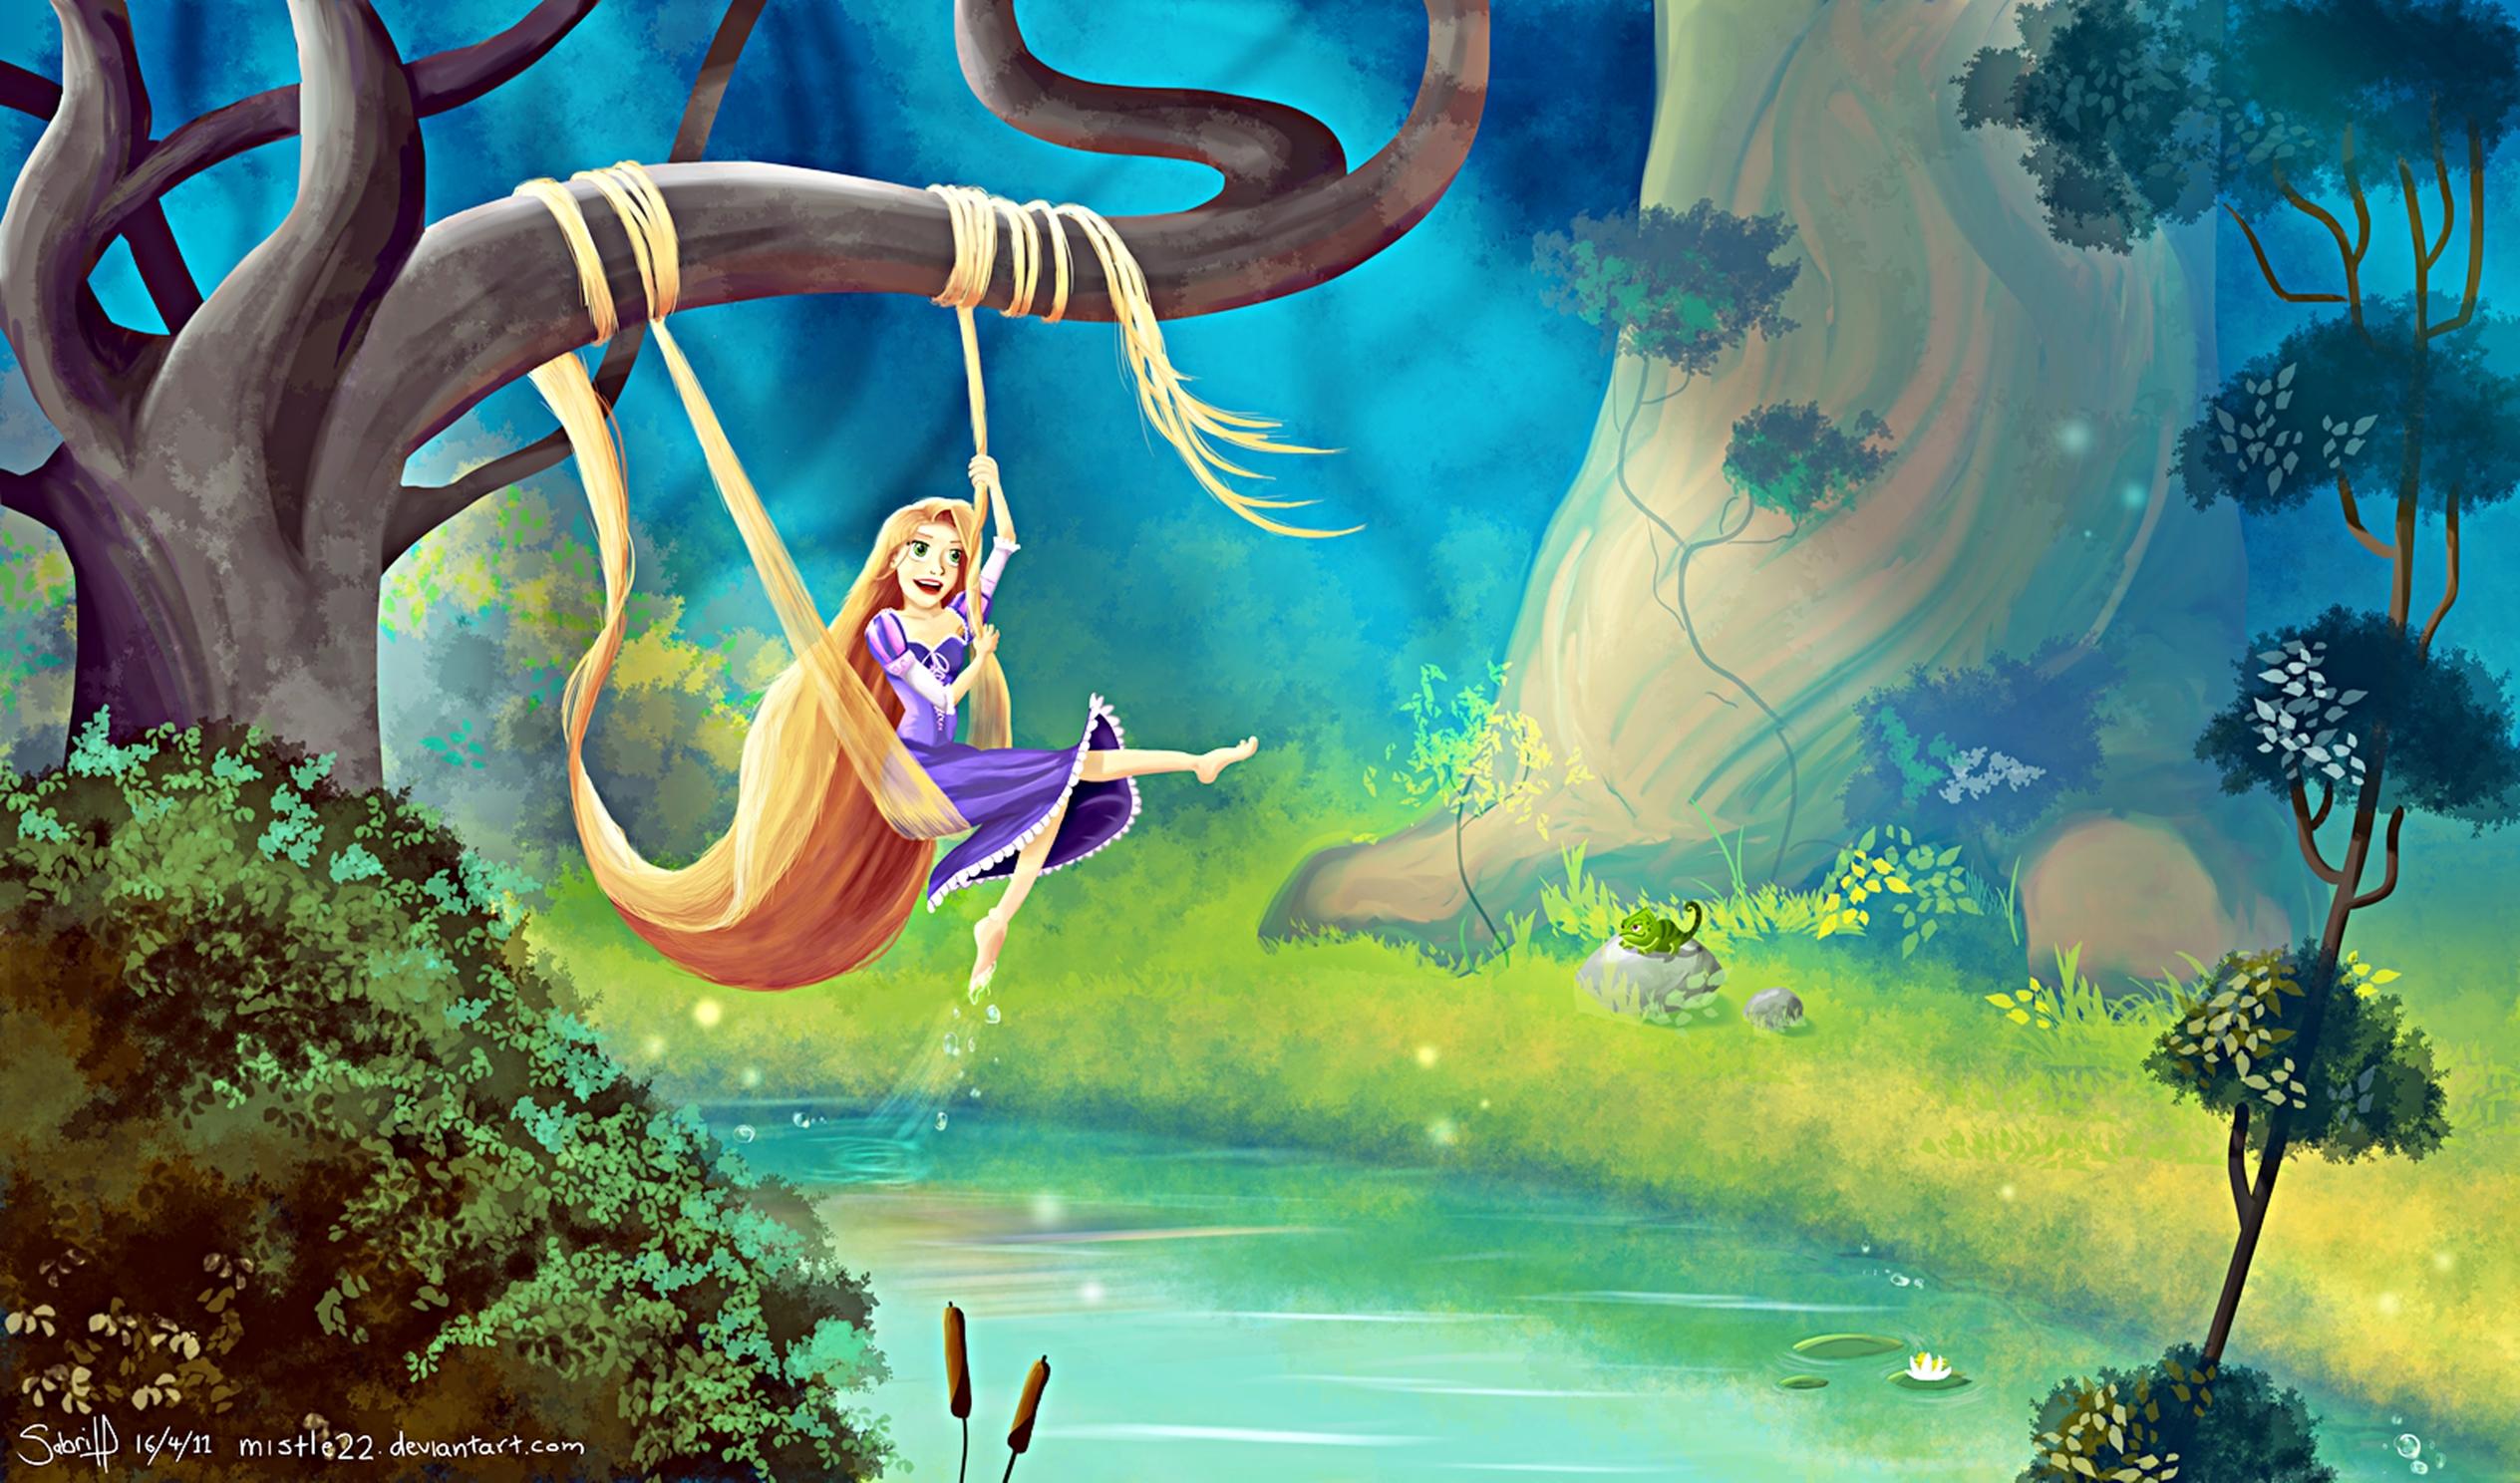 Walt Disney fan Art - Princess Rapunzel & Pascal